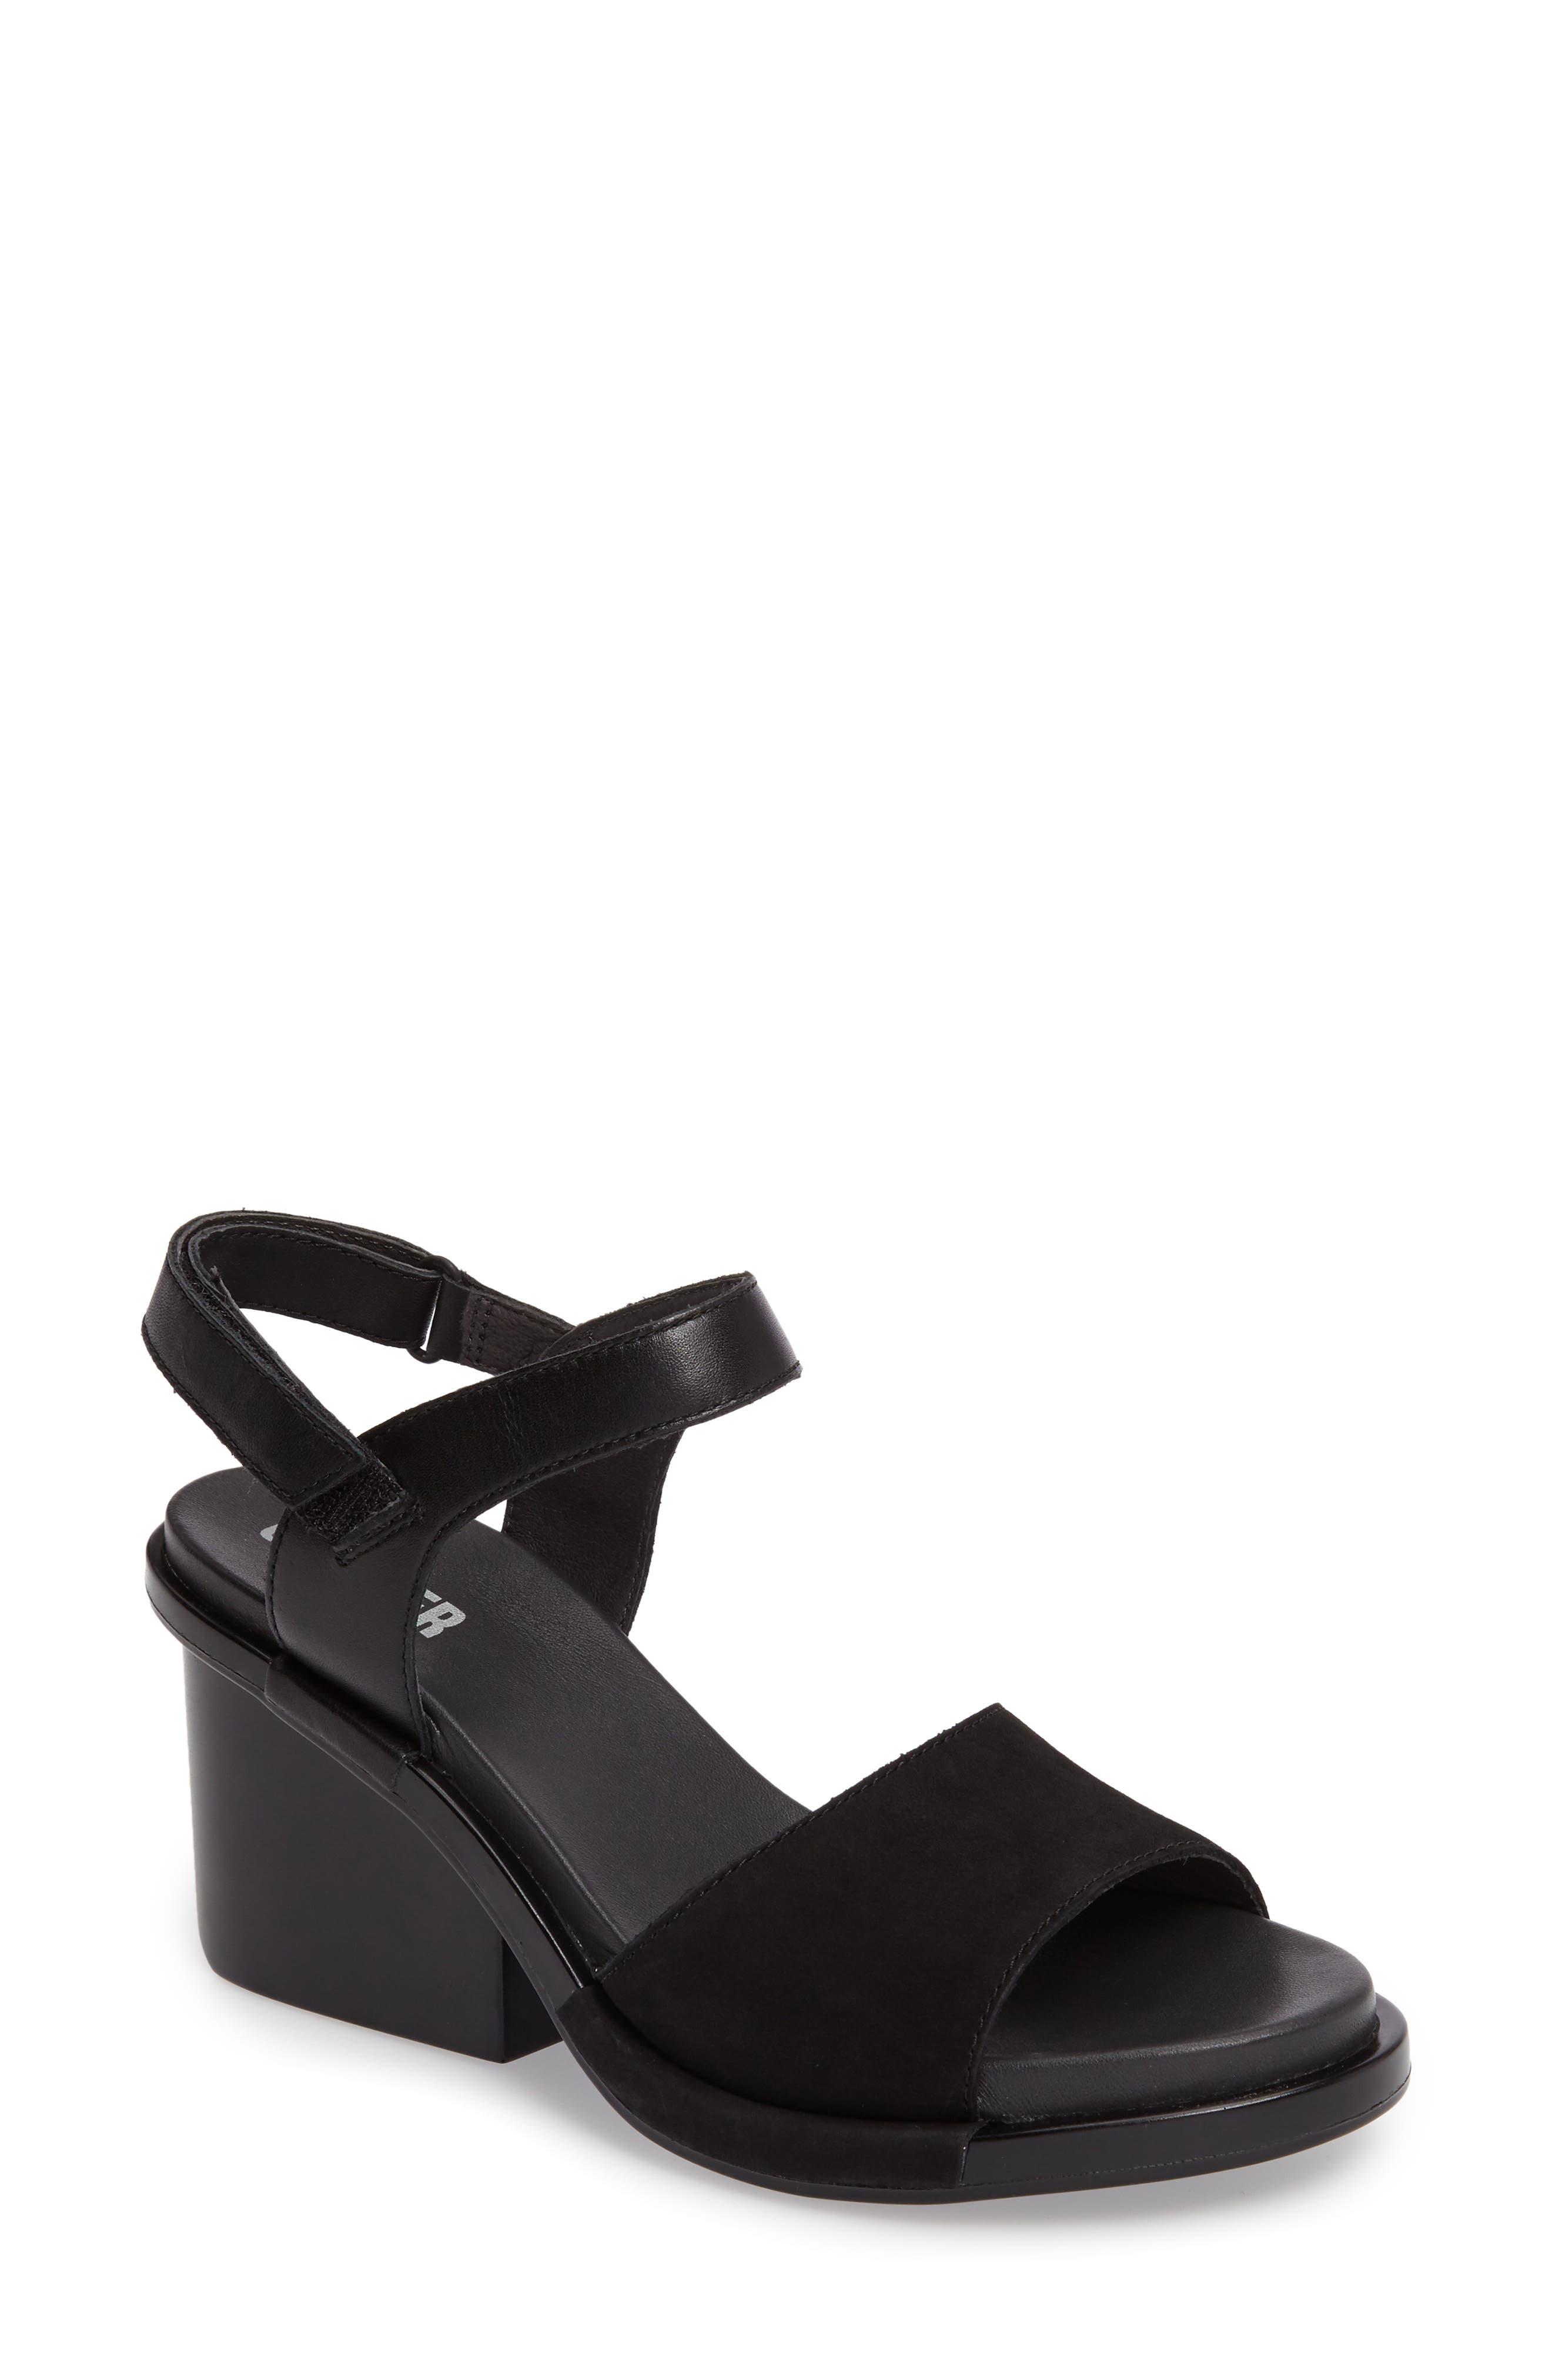 Ivy Ankle Strap Sandal,                             Main thumbnail 1, color,                             Black Leather